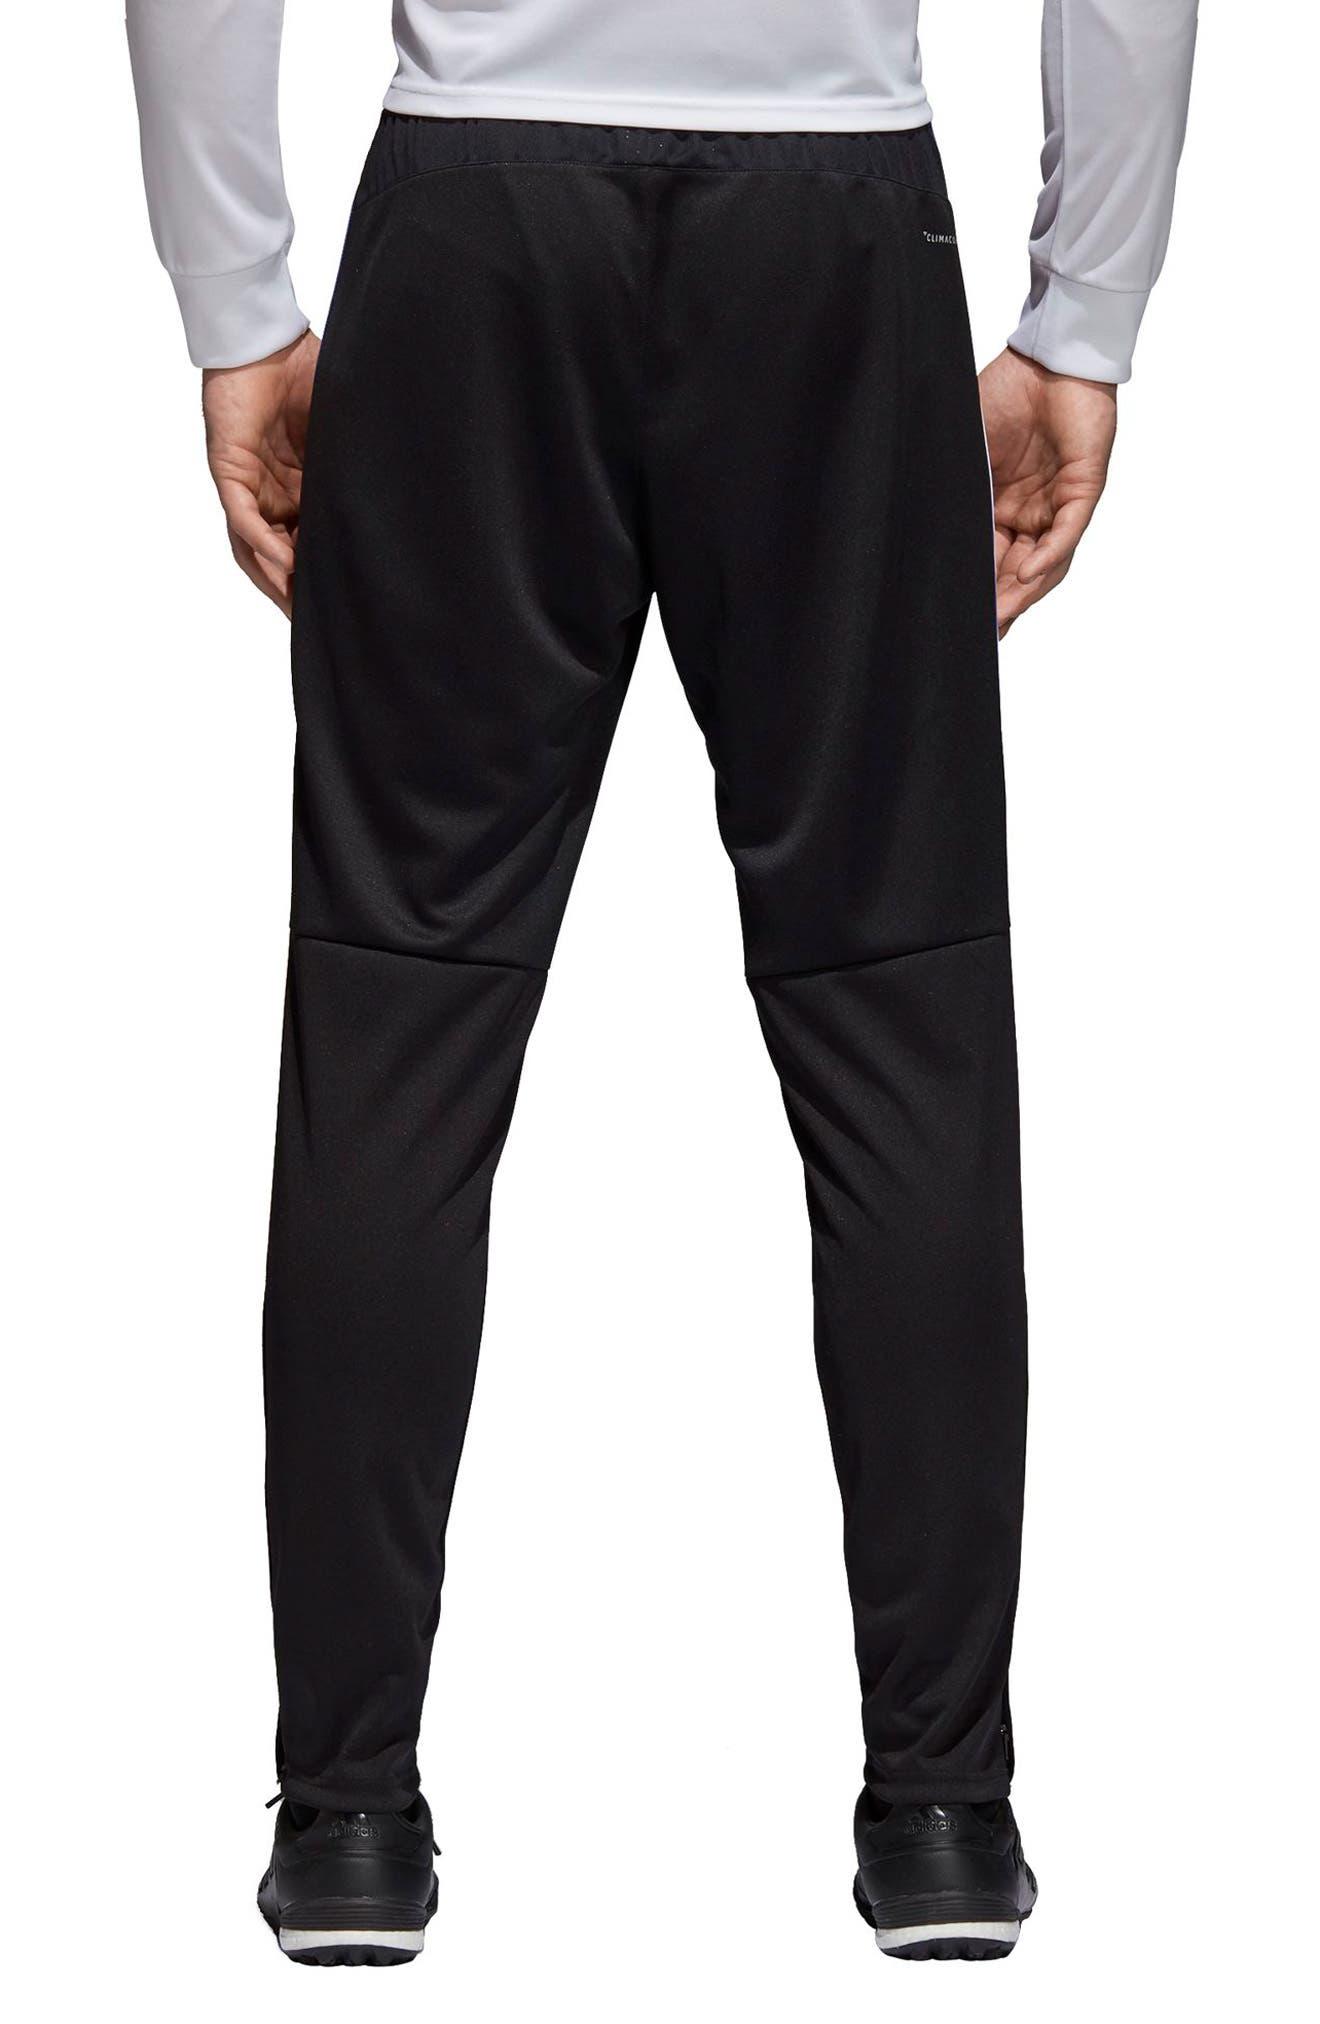 ,                             Tiro 17 Regular Fit Training Pants,                             Alternate thumbnail 2, color,                             BLACK/ RED/ WHITE/ BLUE